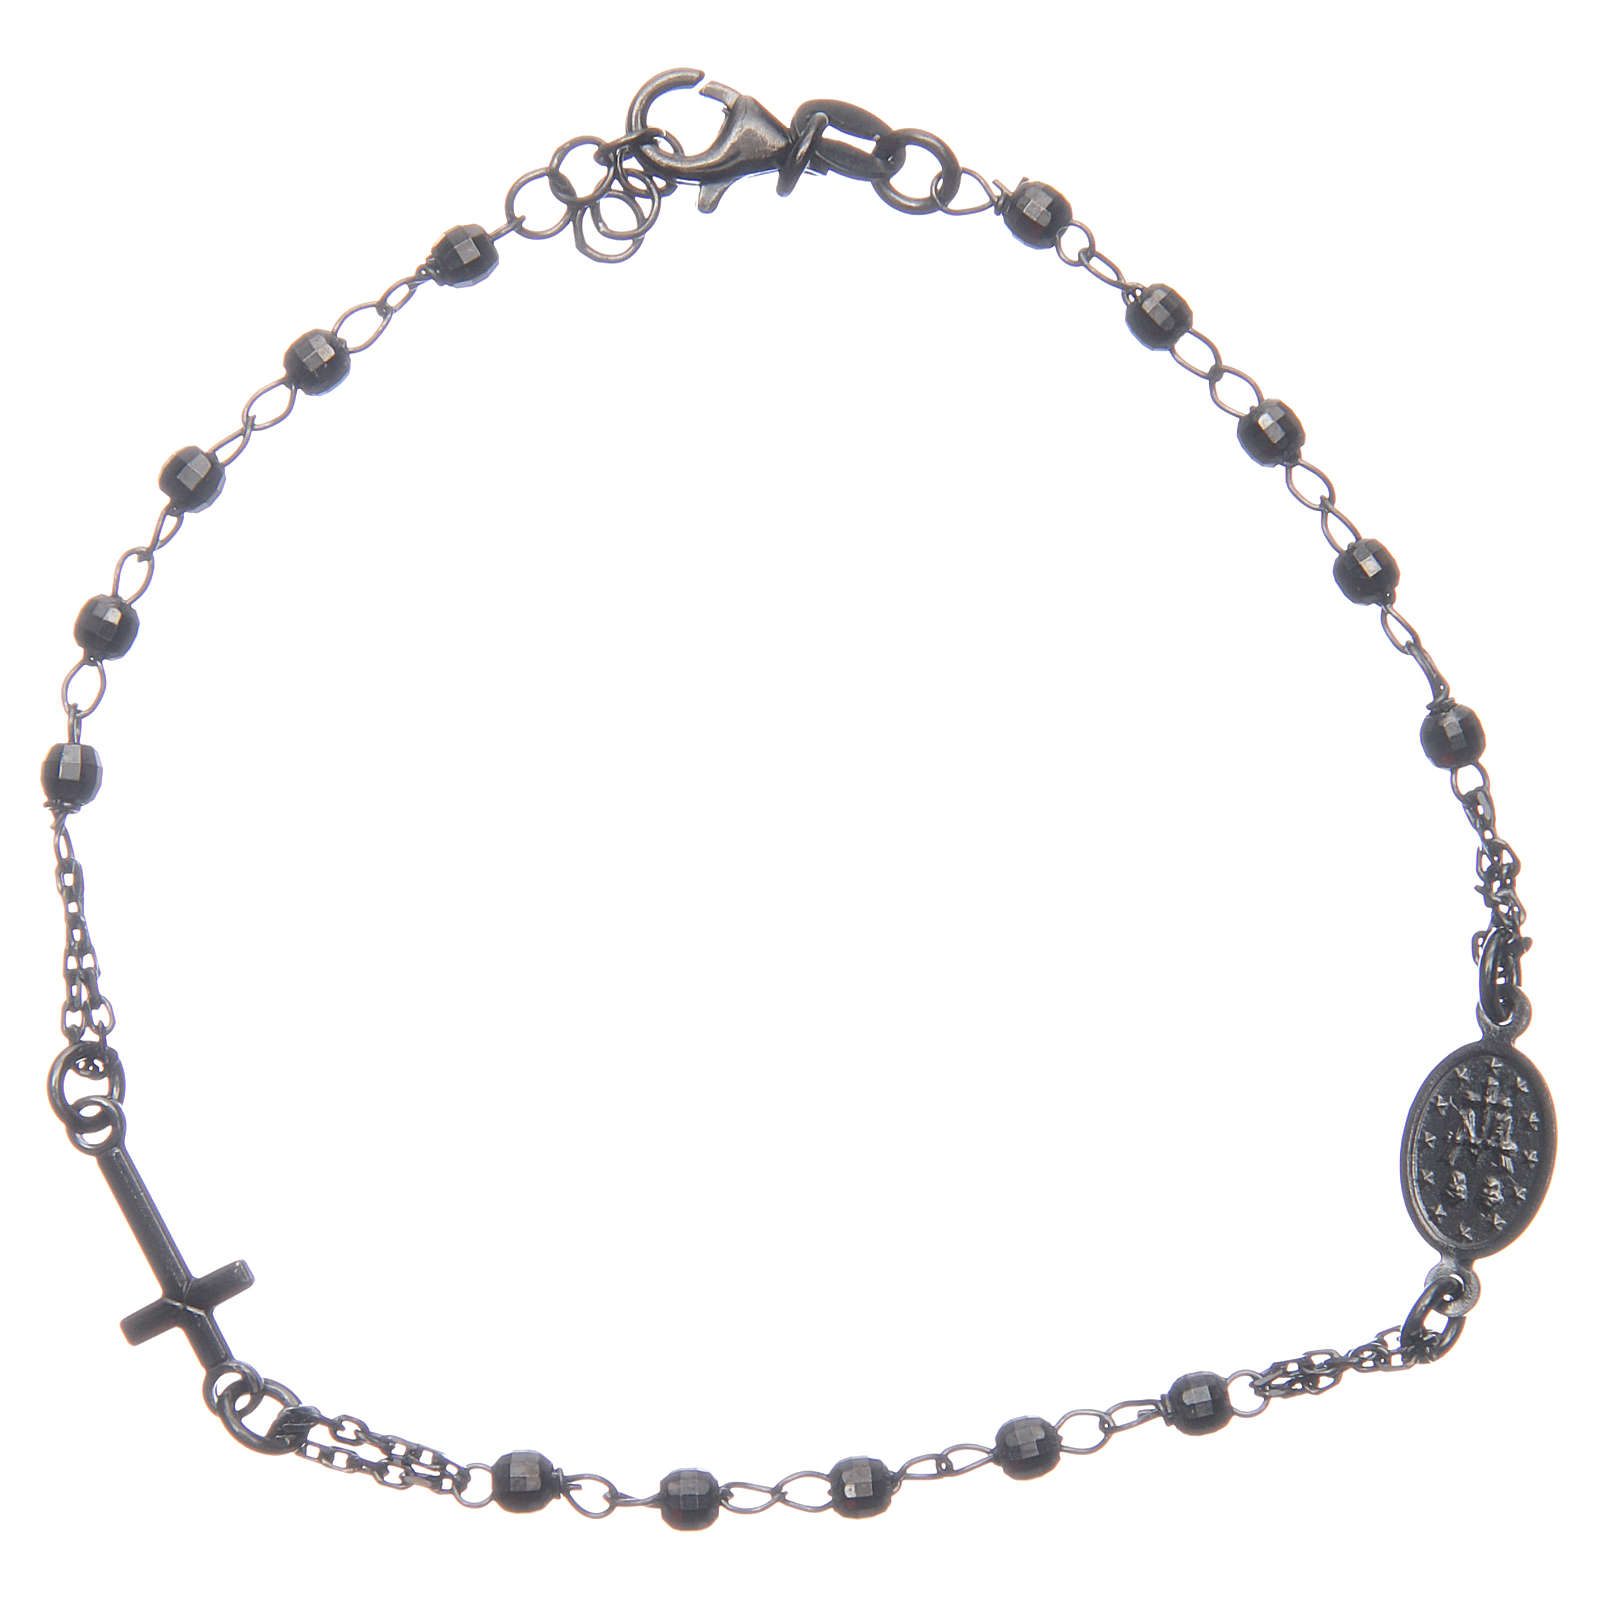 Bracciale rosario colore nero fumé argento 925 4